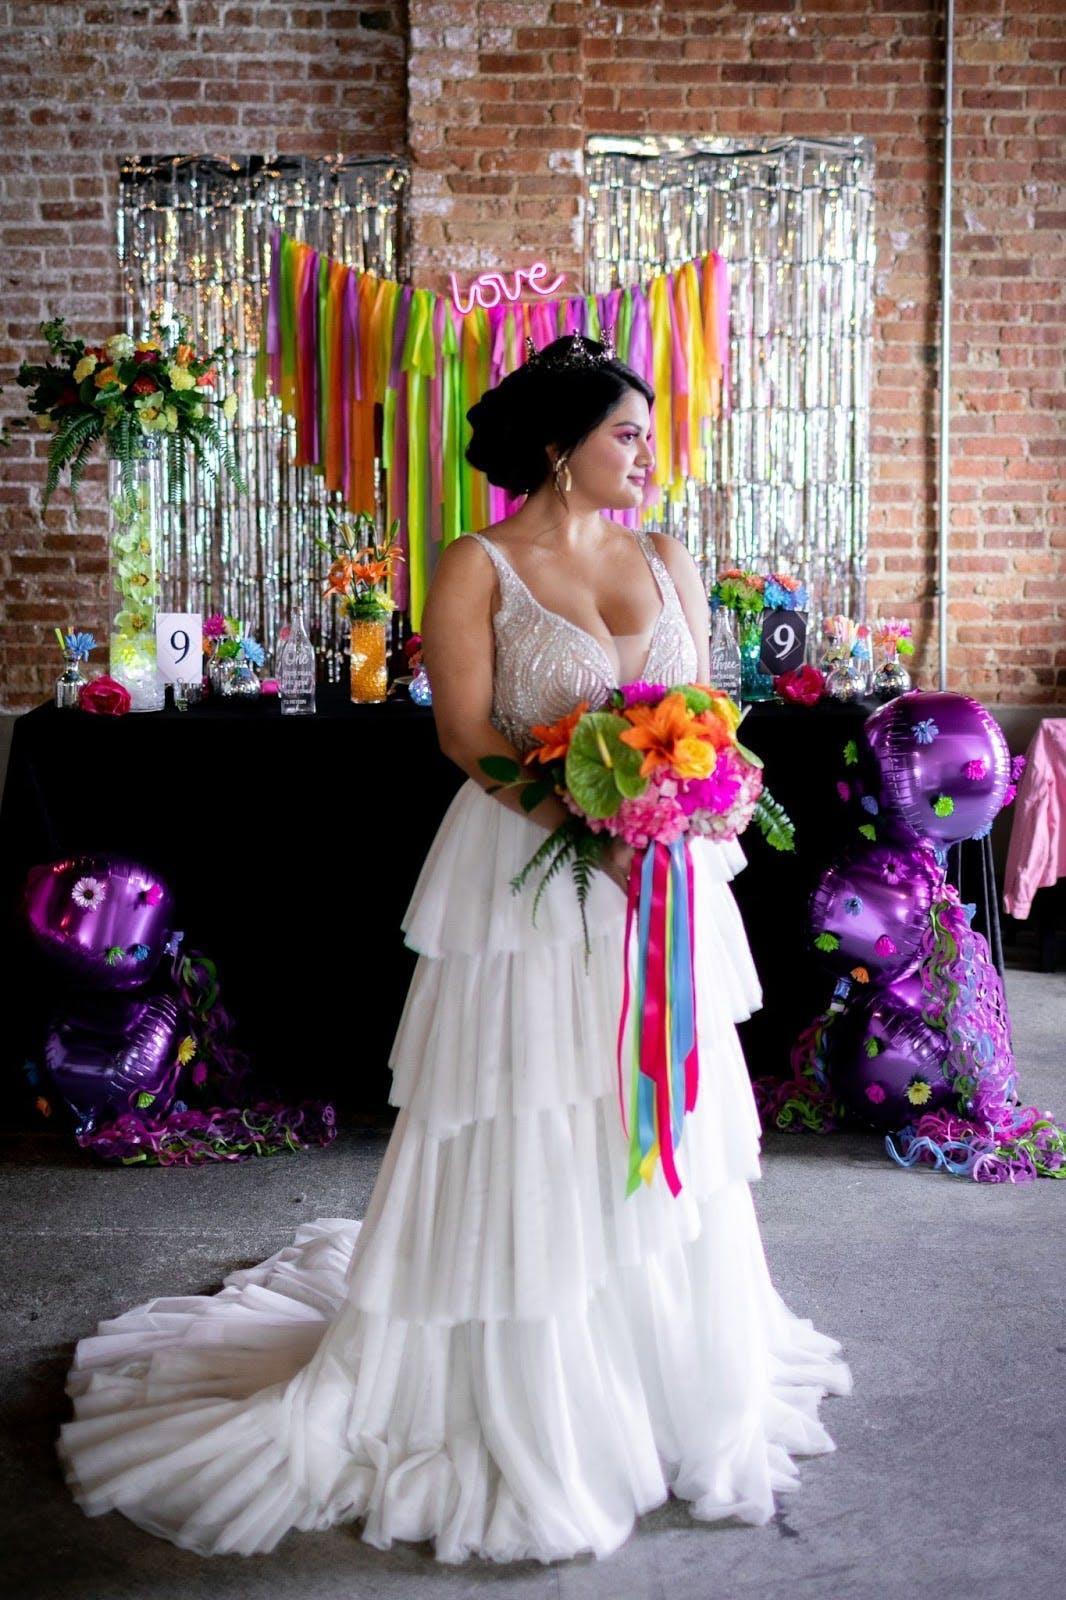 Neon inspired wedding ideas